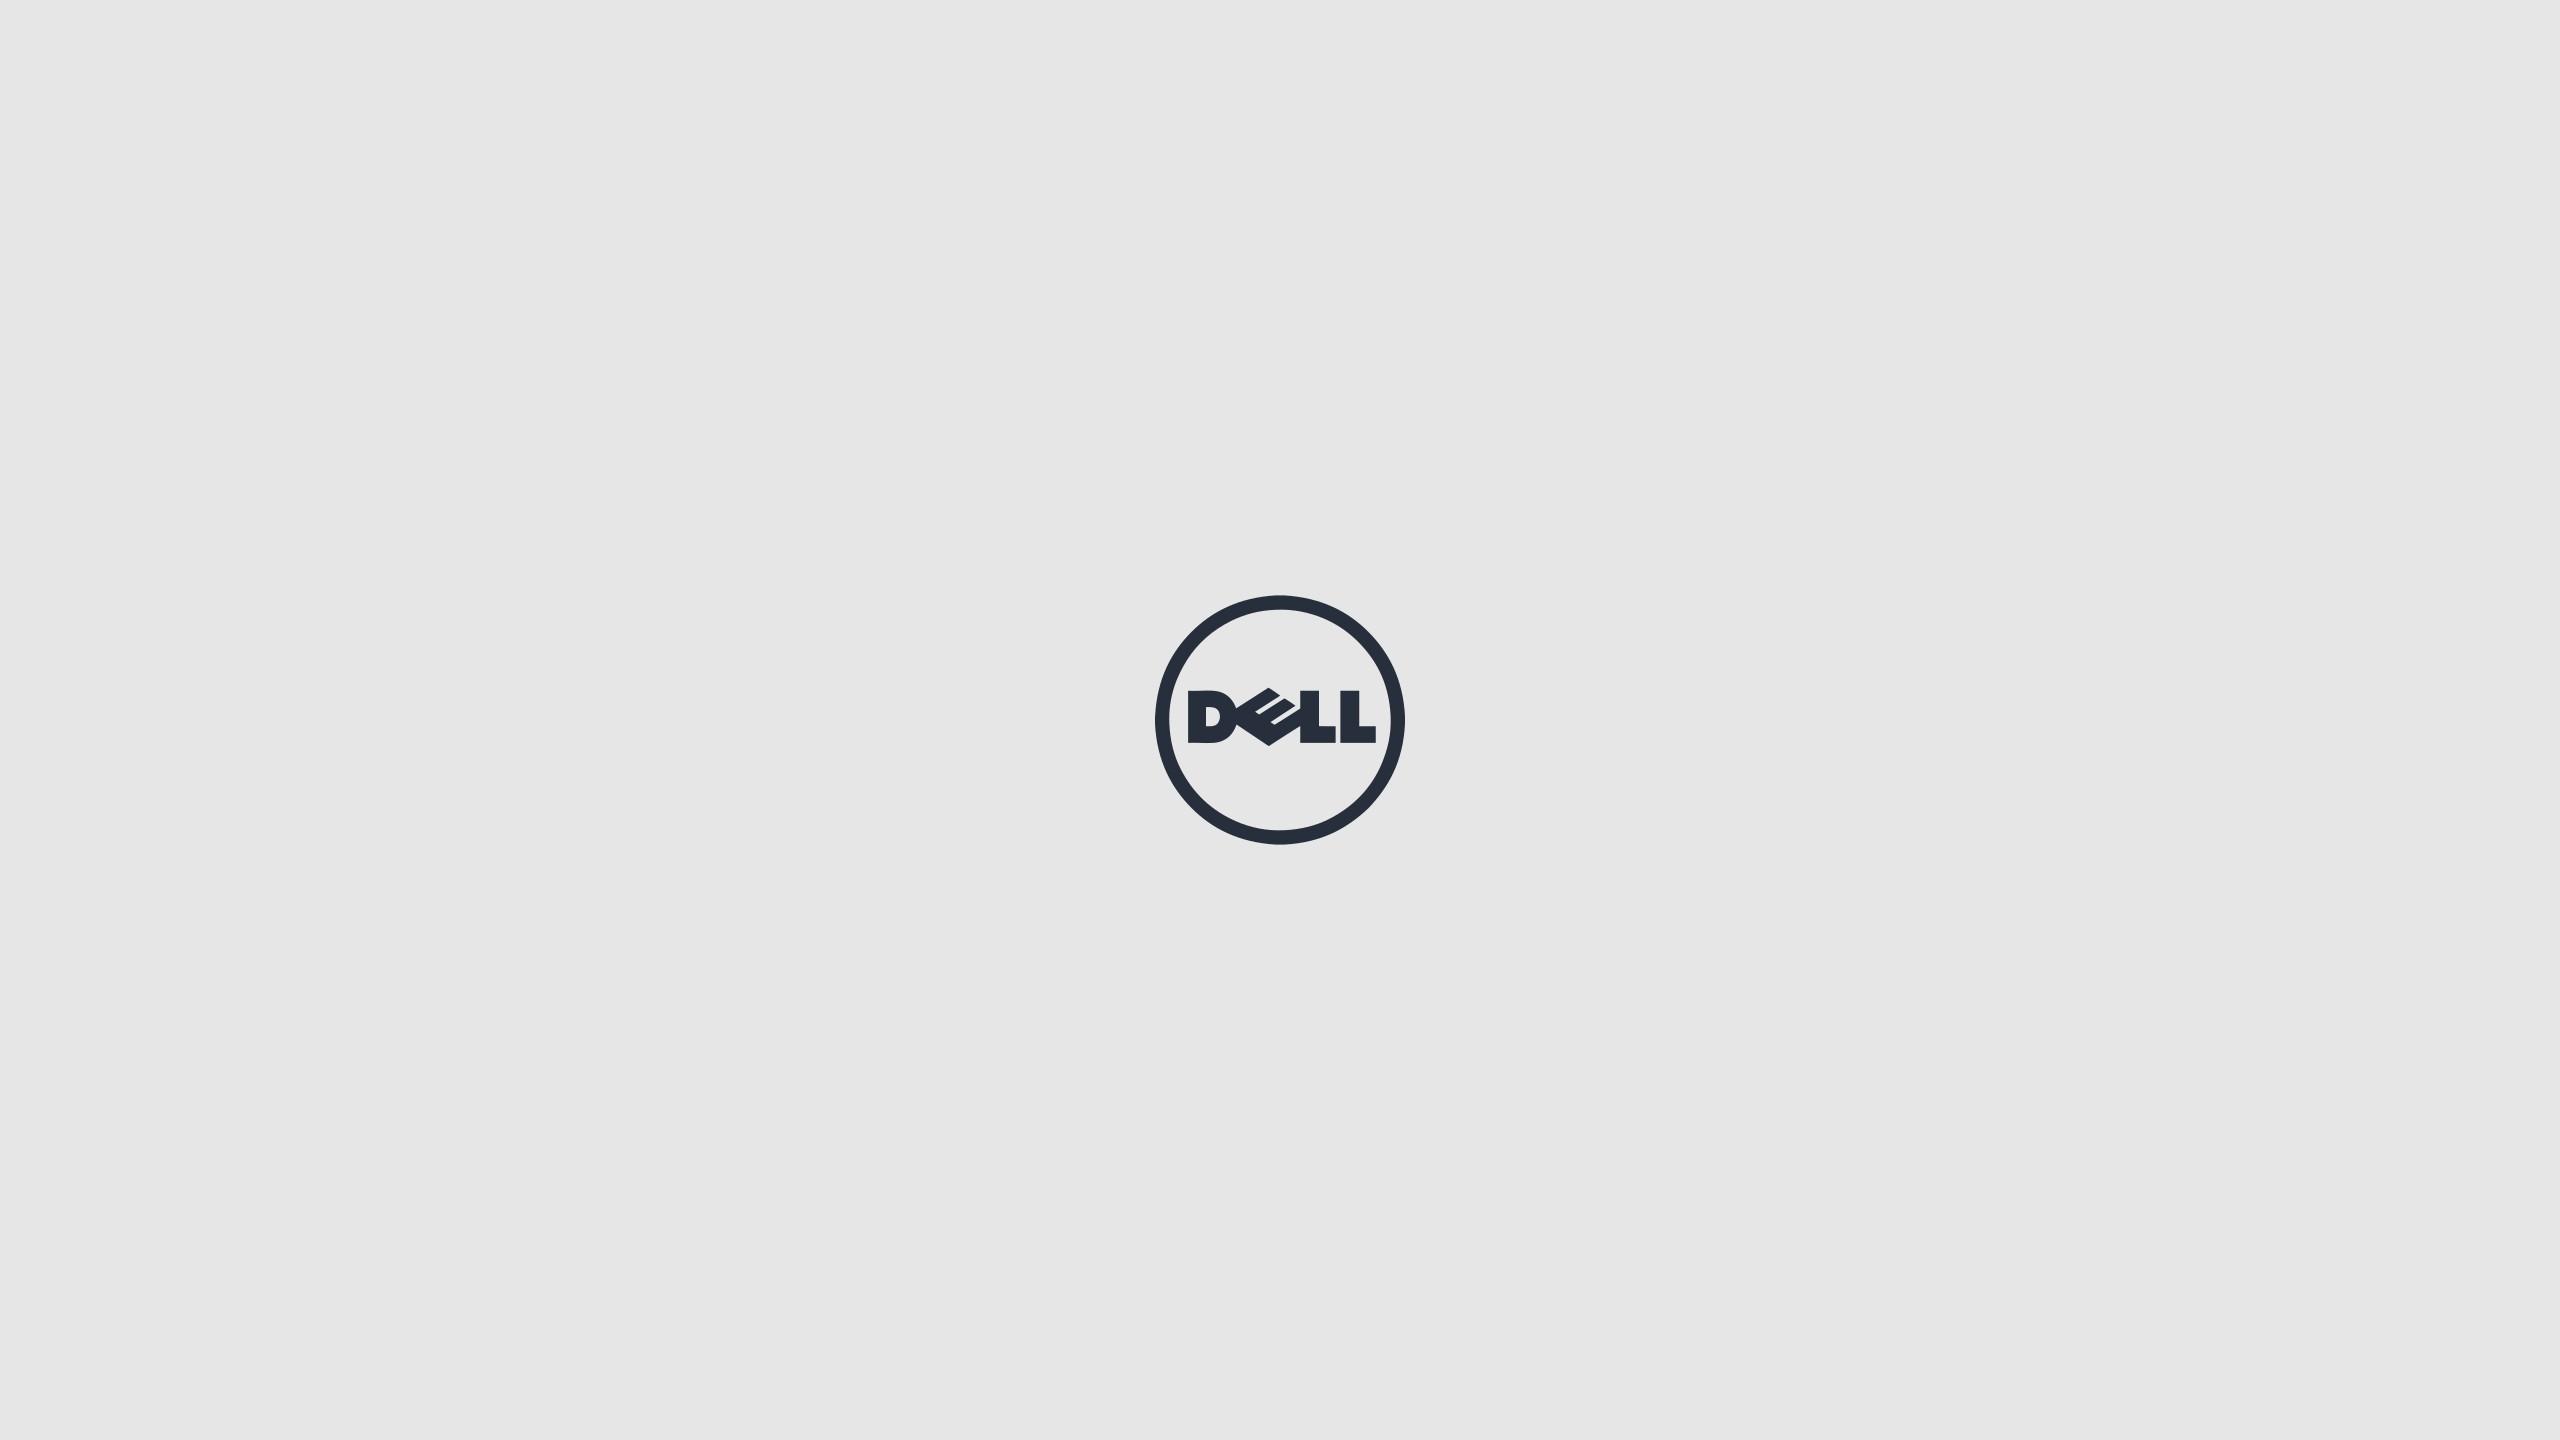 Papel De Parede Dell G3: Papel De Parede : 2560x1440 Px, Marcas, Dell, Logotipo